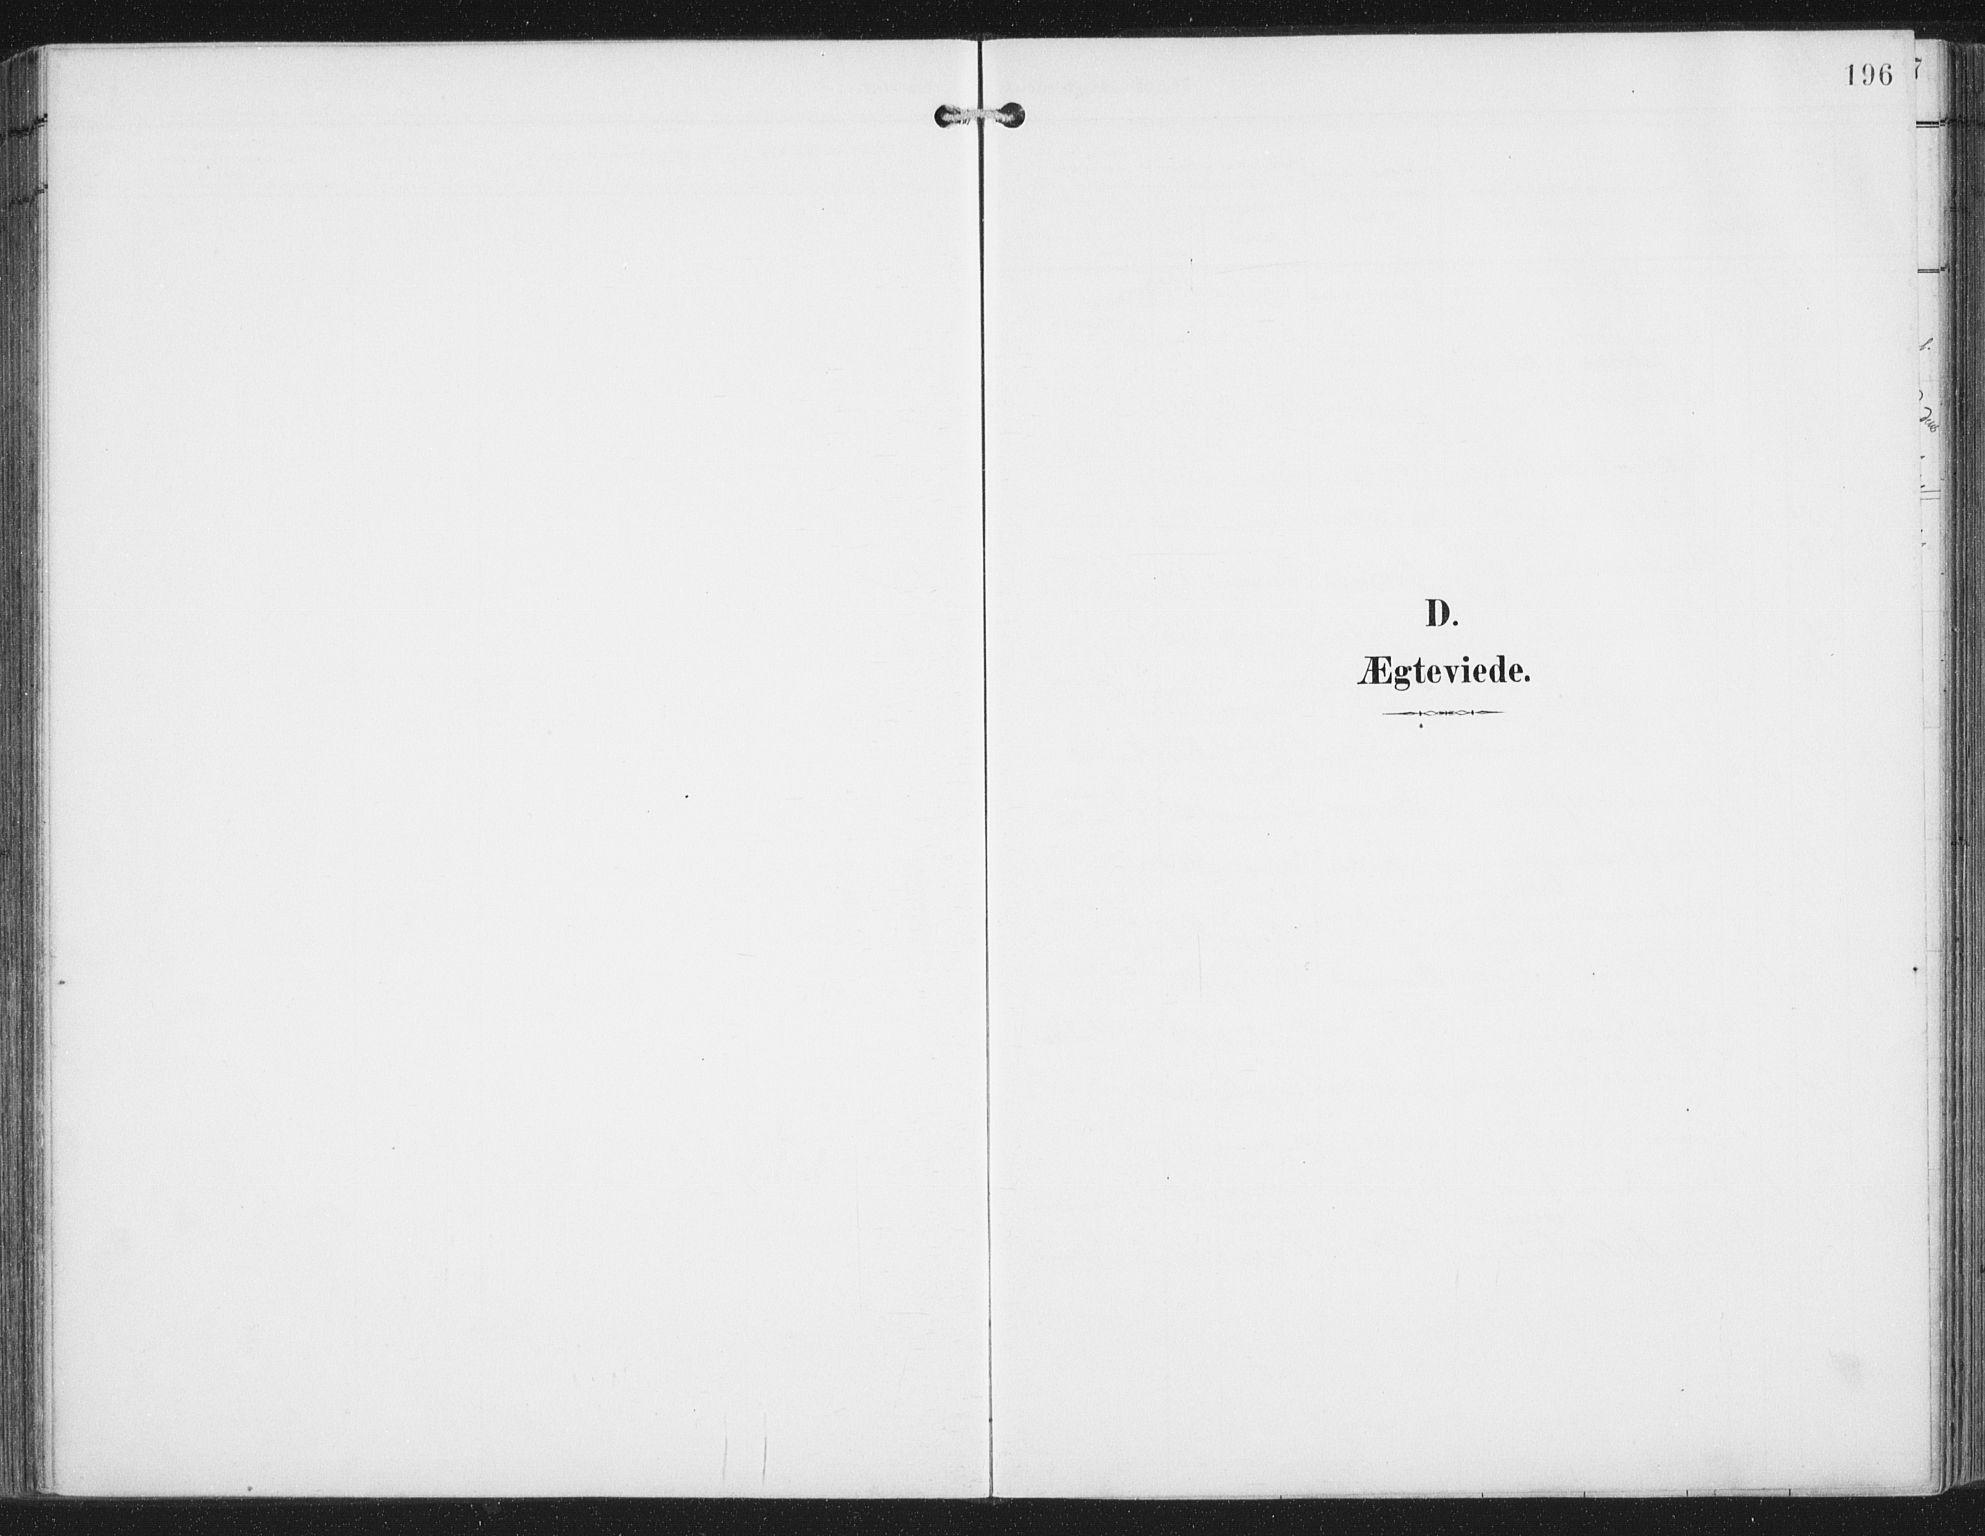 SAT, Ministerialprotokoller, klokkerbøker og fødselsregistre - Nordland, 876/L1098: Ministerialbok nr. 876A04, 1896-1915, s. 196